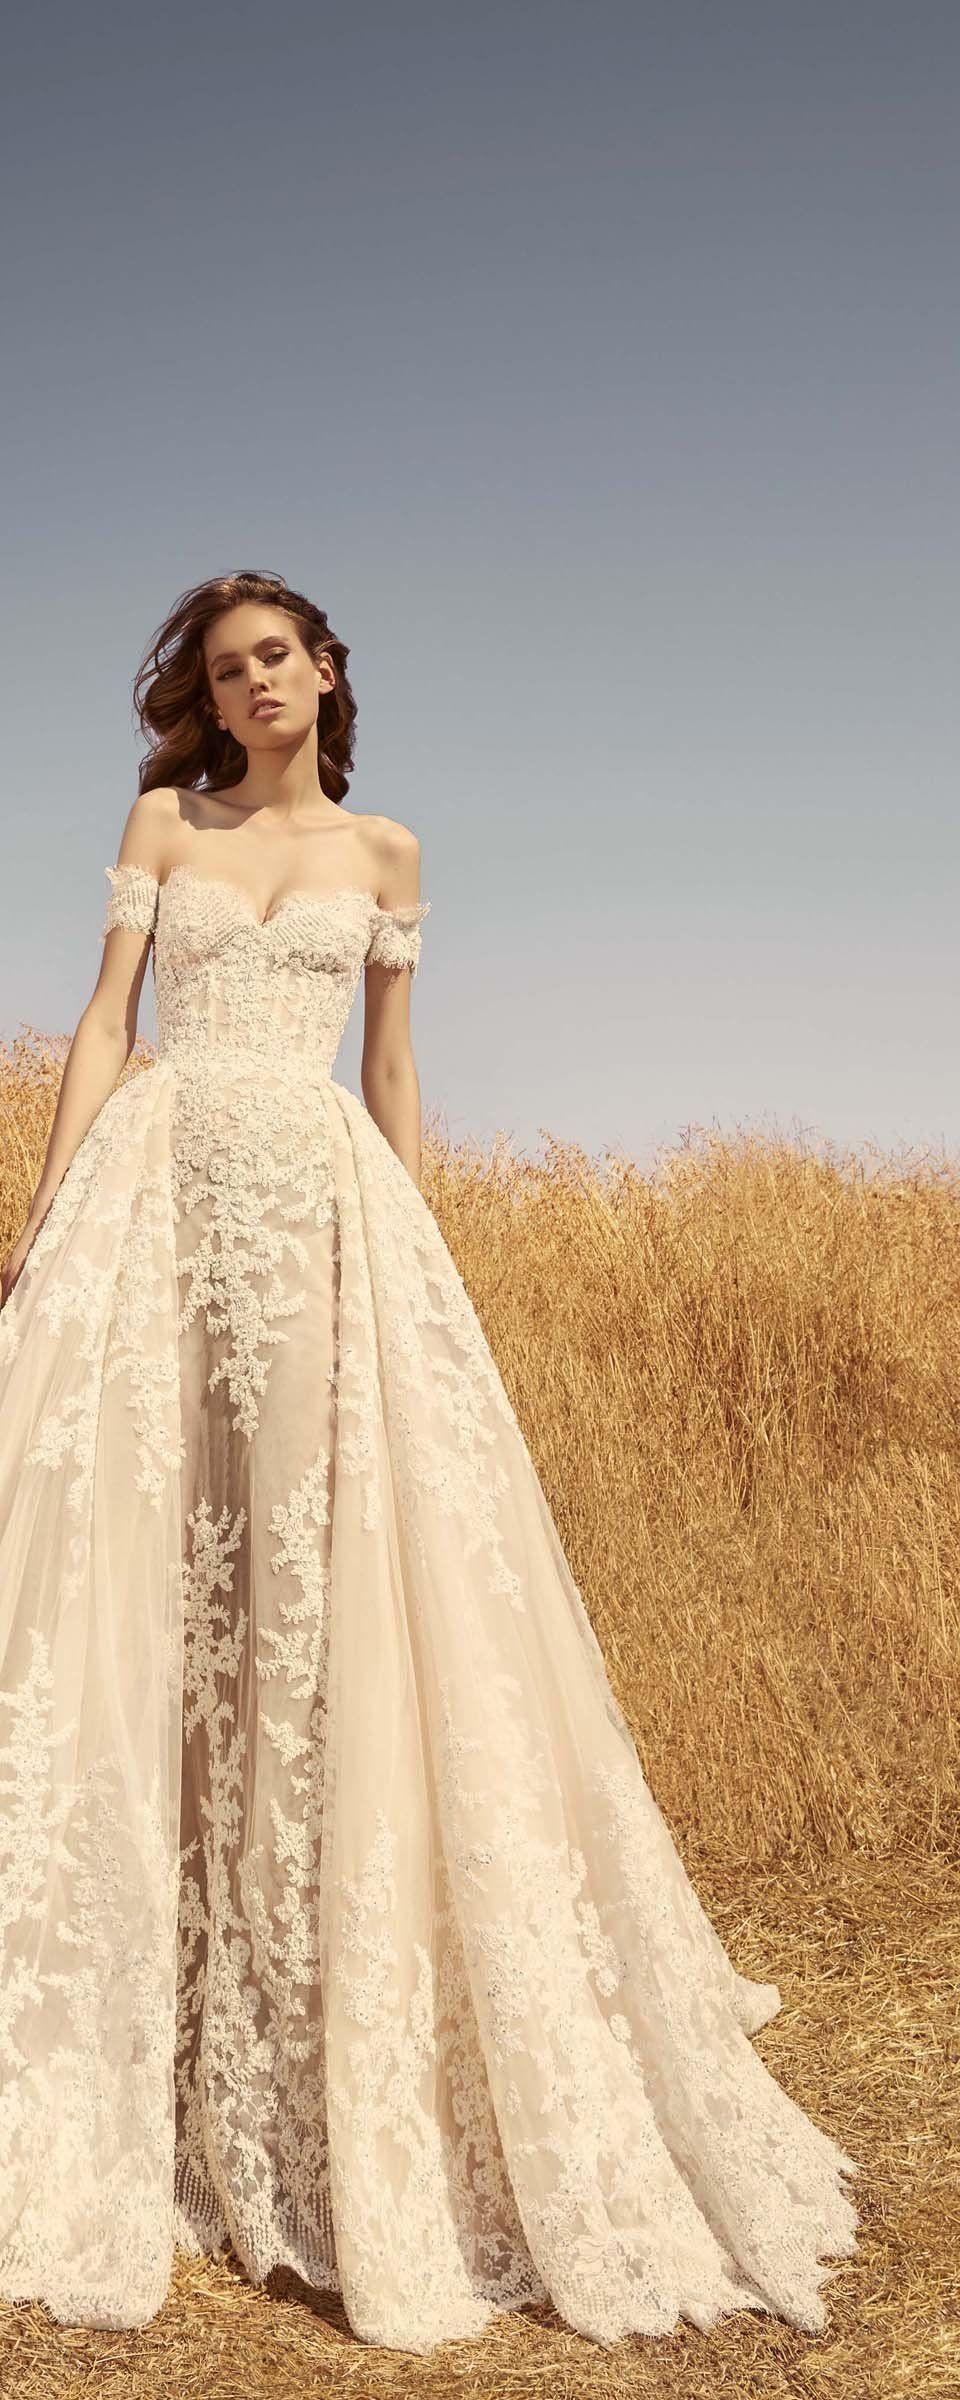 Zuhair Murad Bridal 2020 Bridal Zuhair Murad Bridal Long Wedding Dresses Bridal